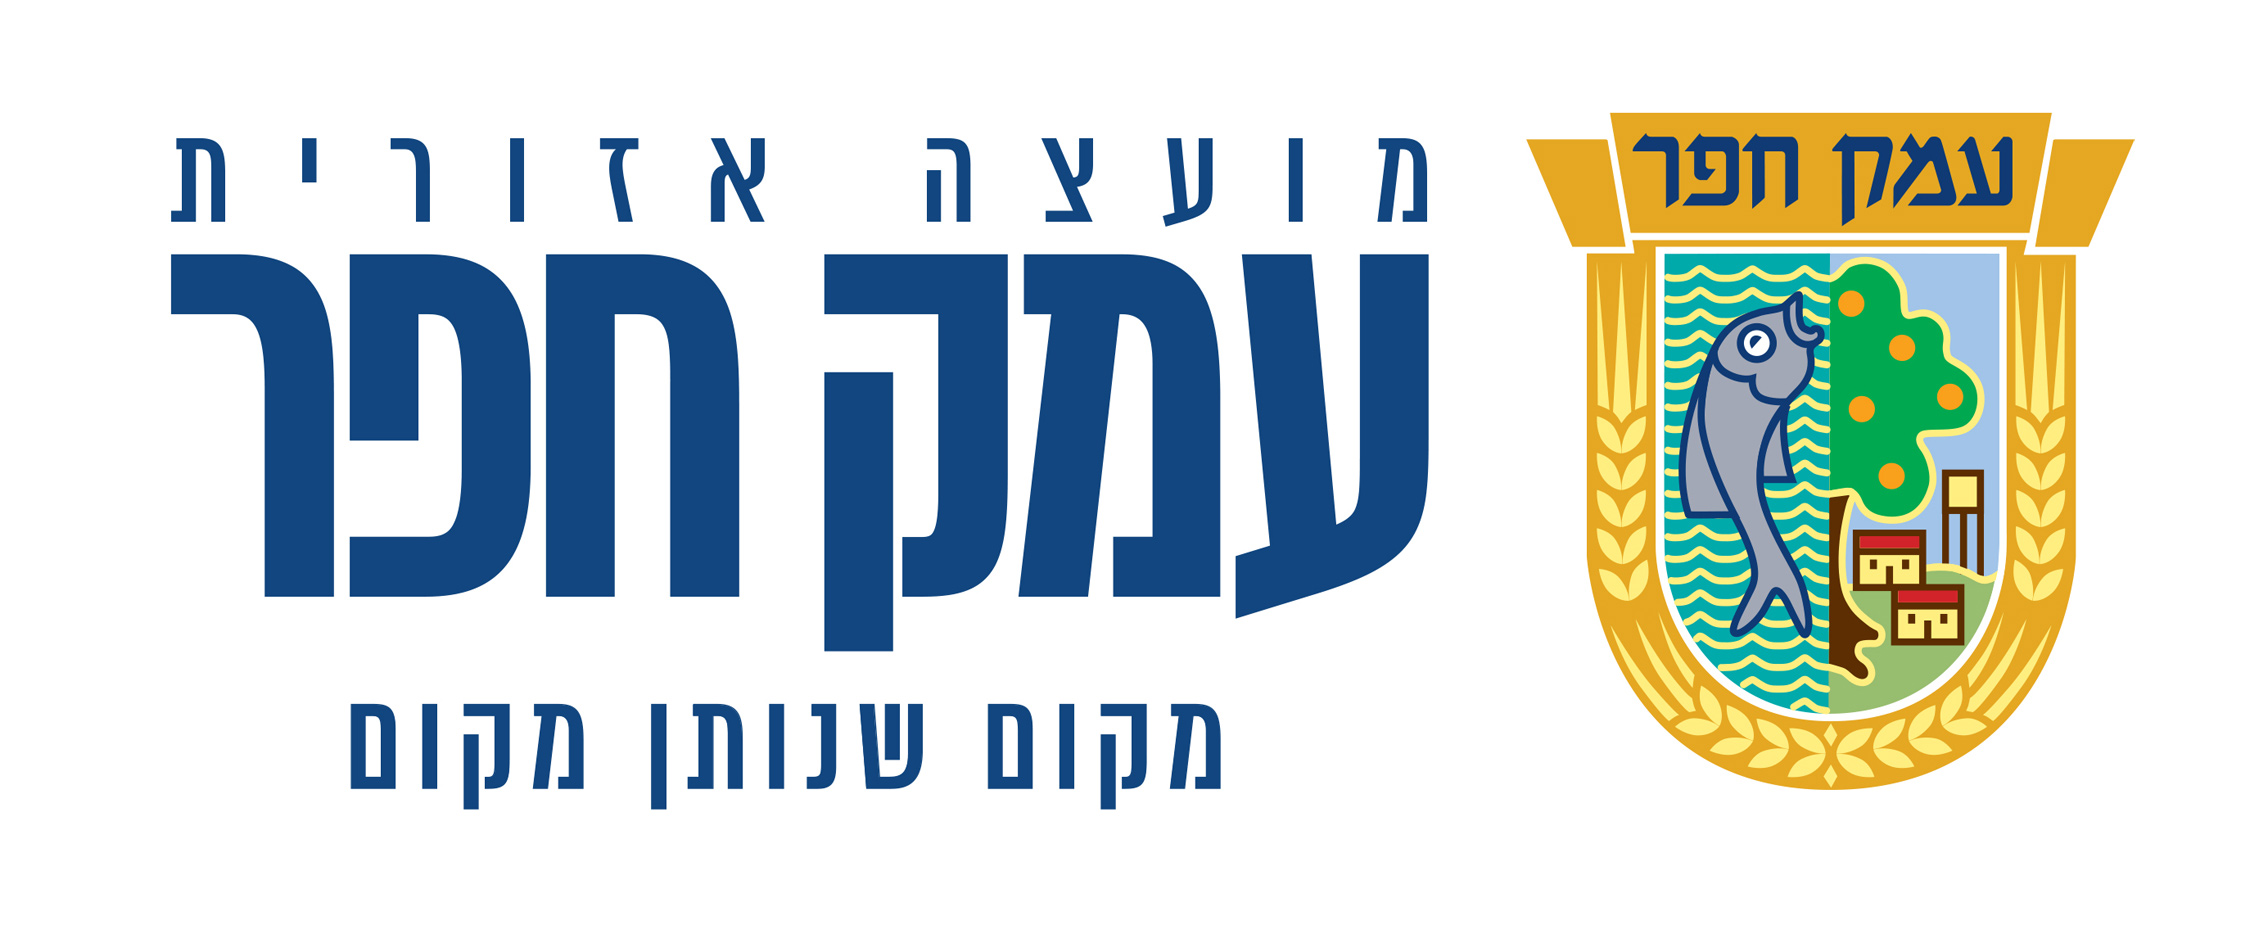 Hefer-Logo+Slogan.jpg